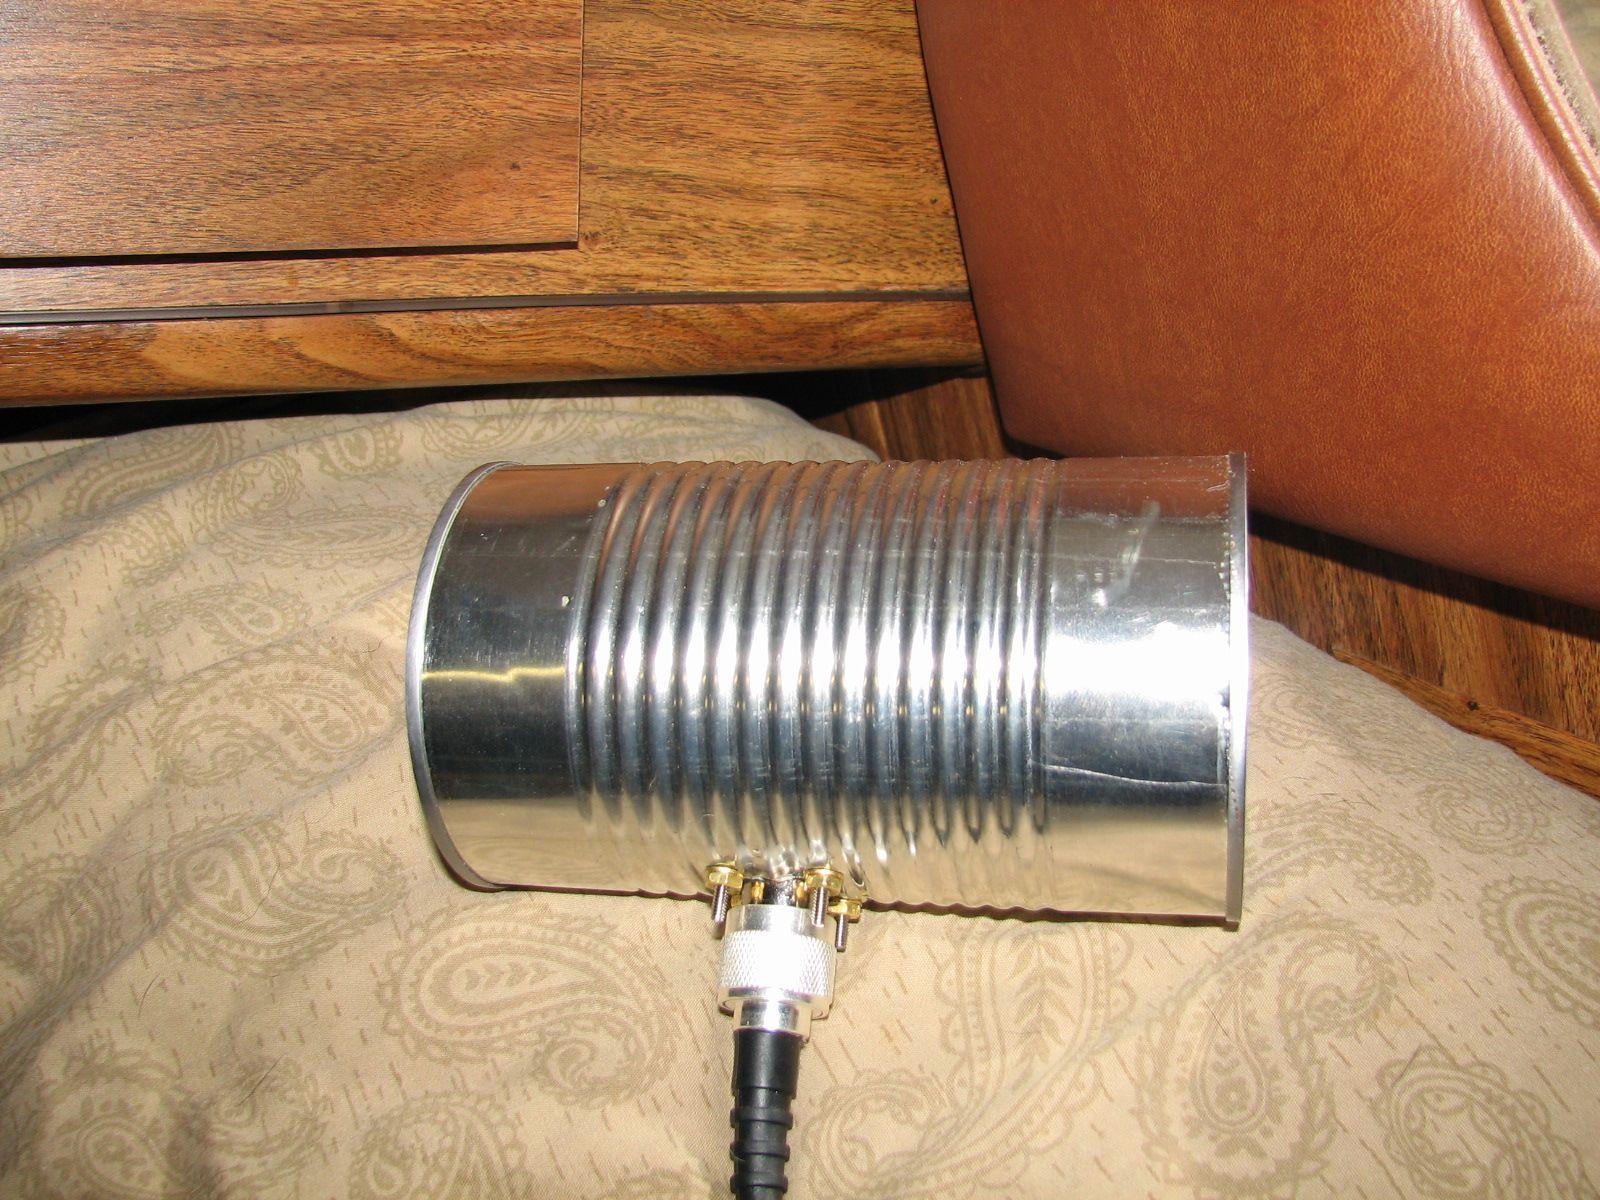 How to Make a Cantenna - Homemade Wi-Fi Antenna | Diy tv ...